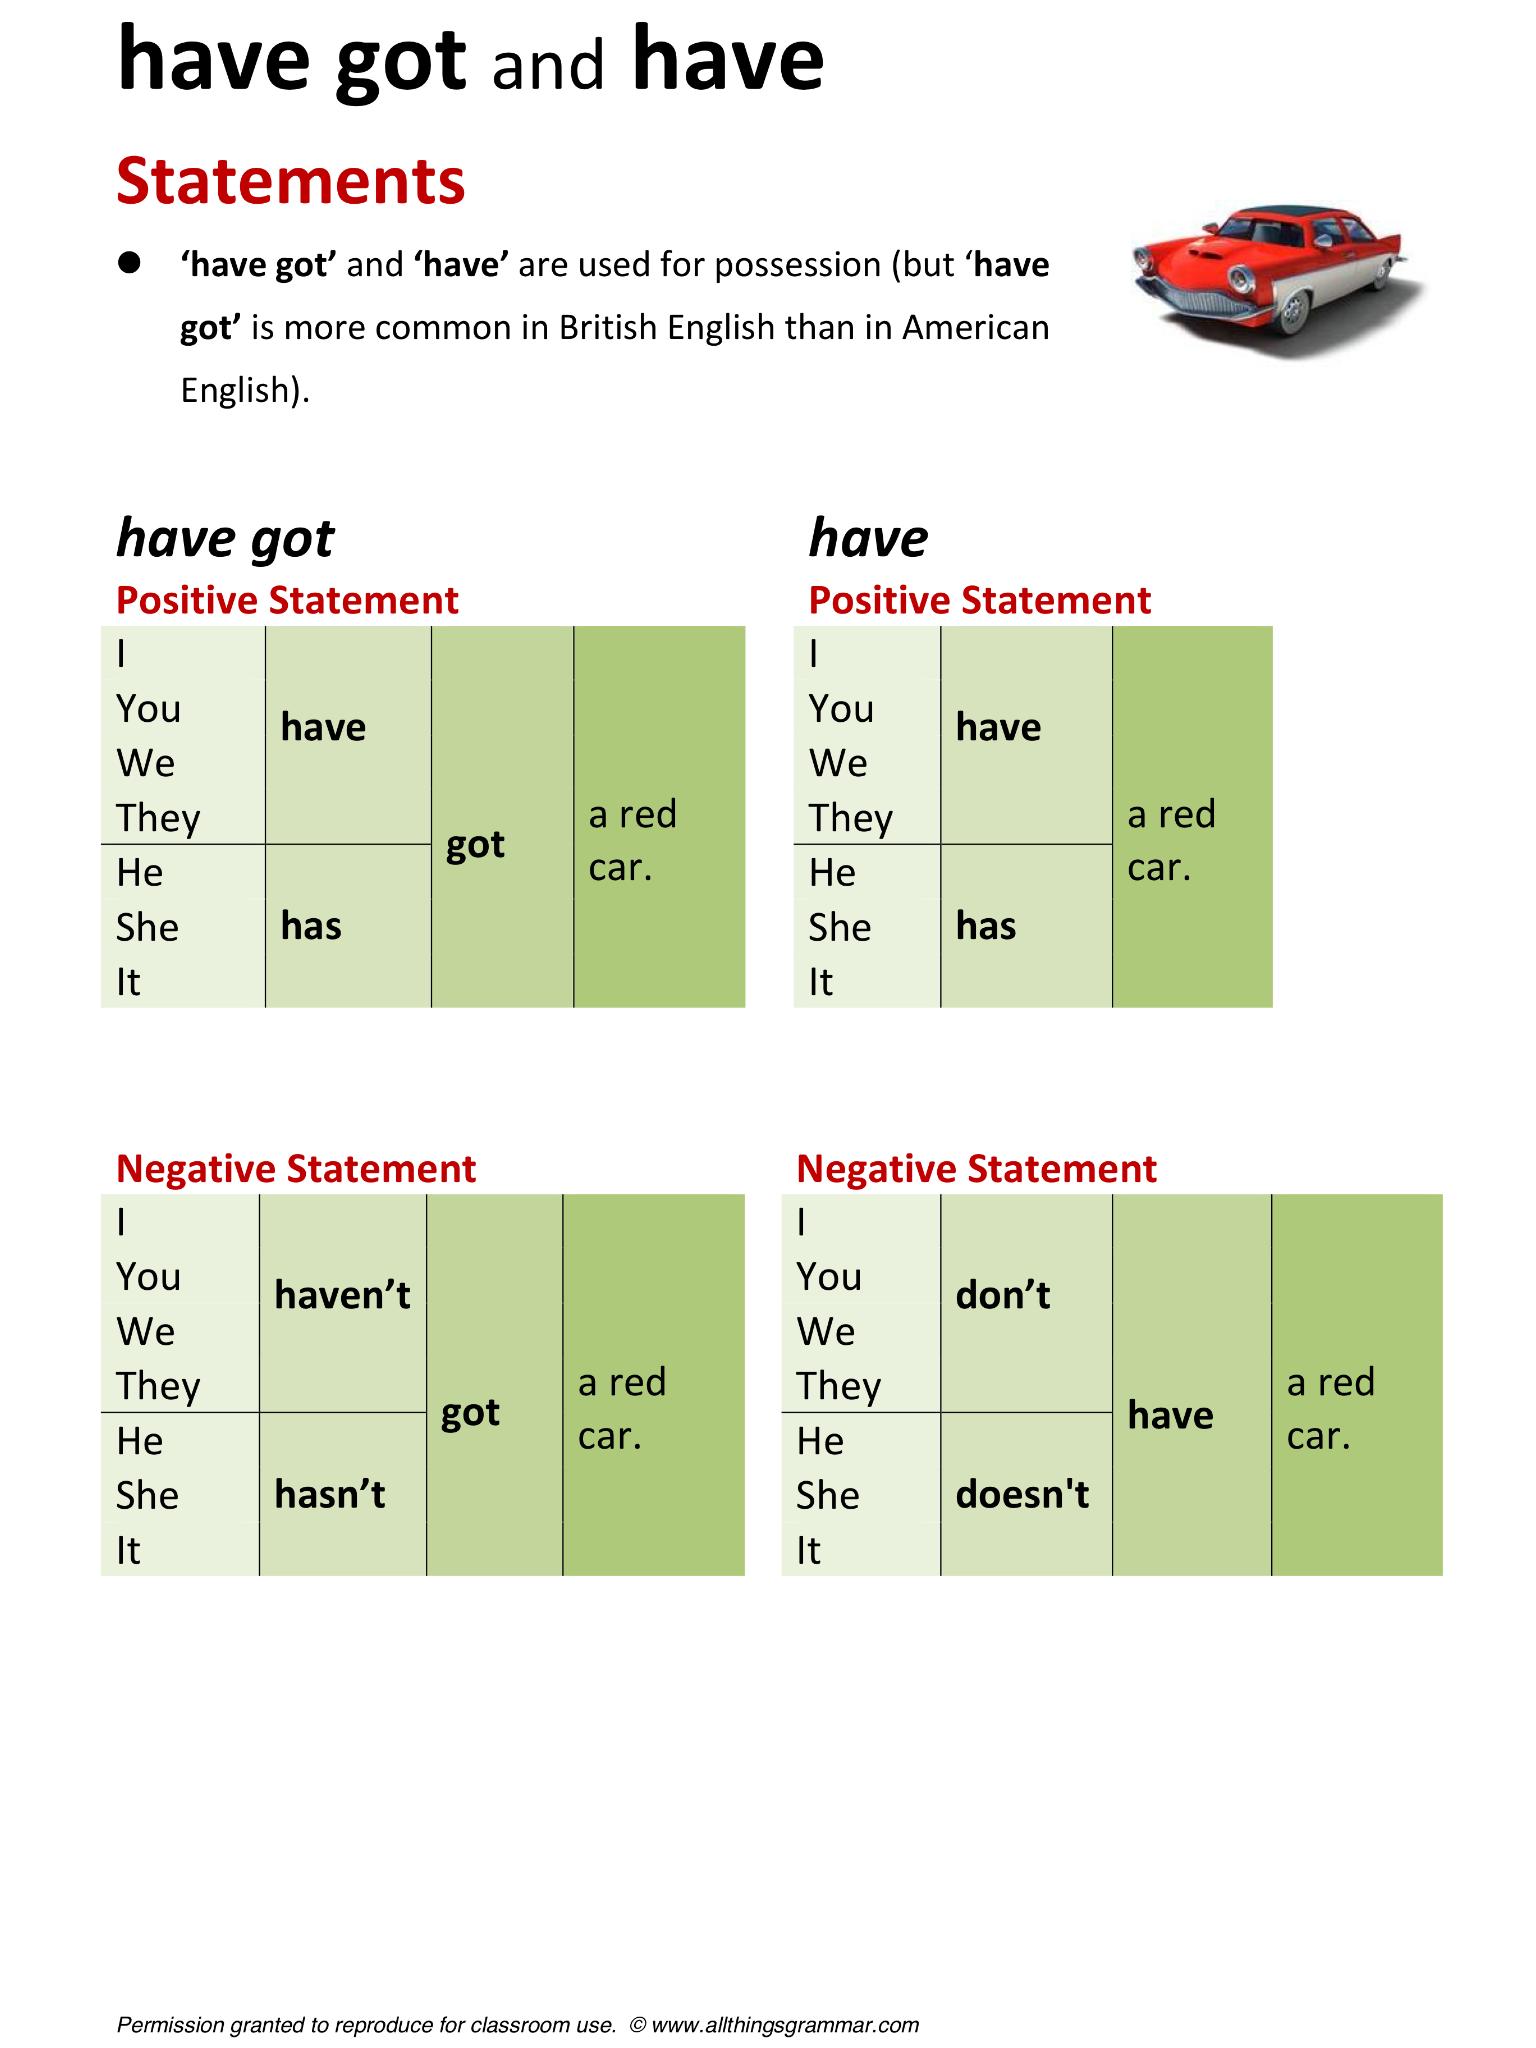 English Grammar Have Got And Have Statements